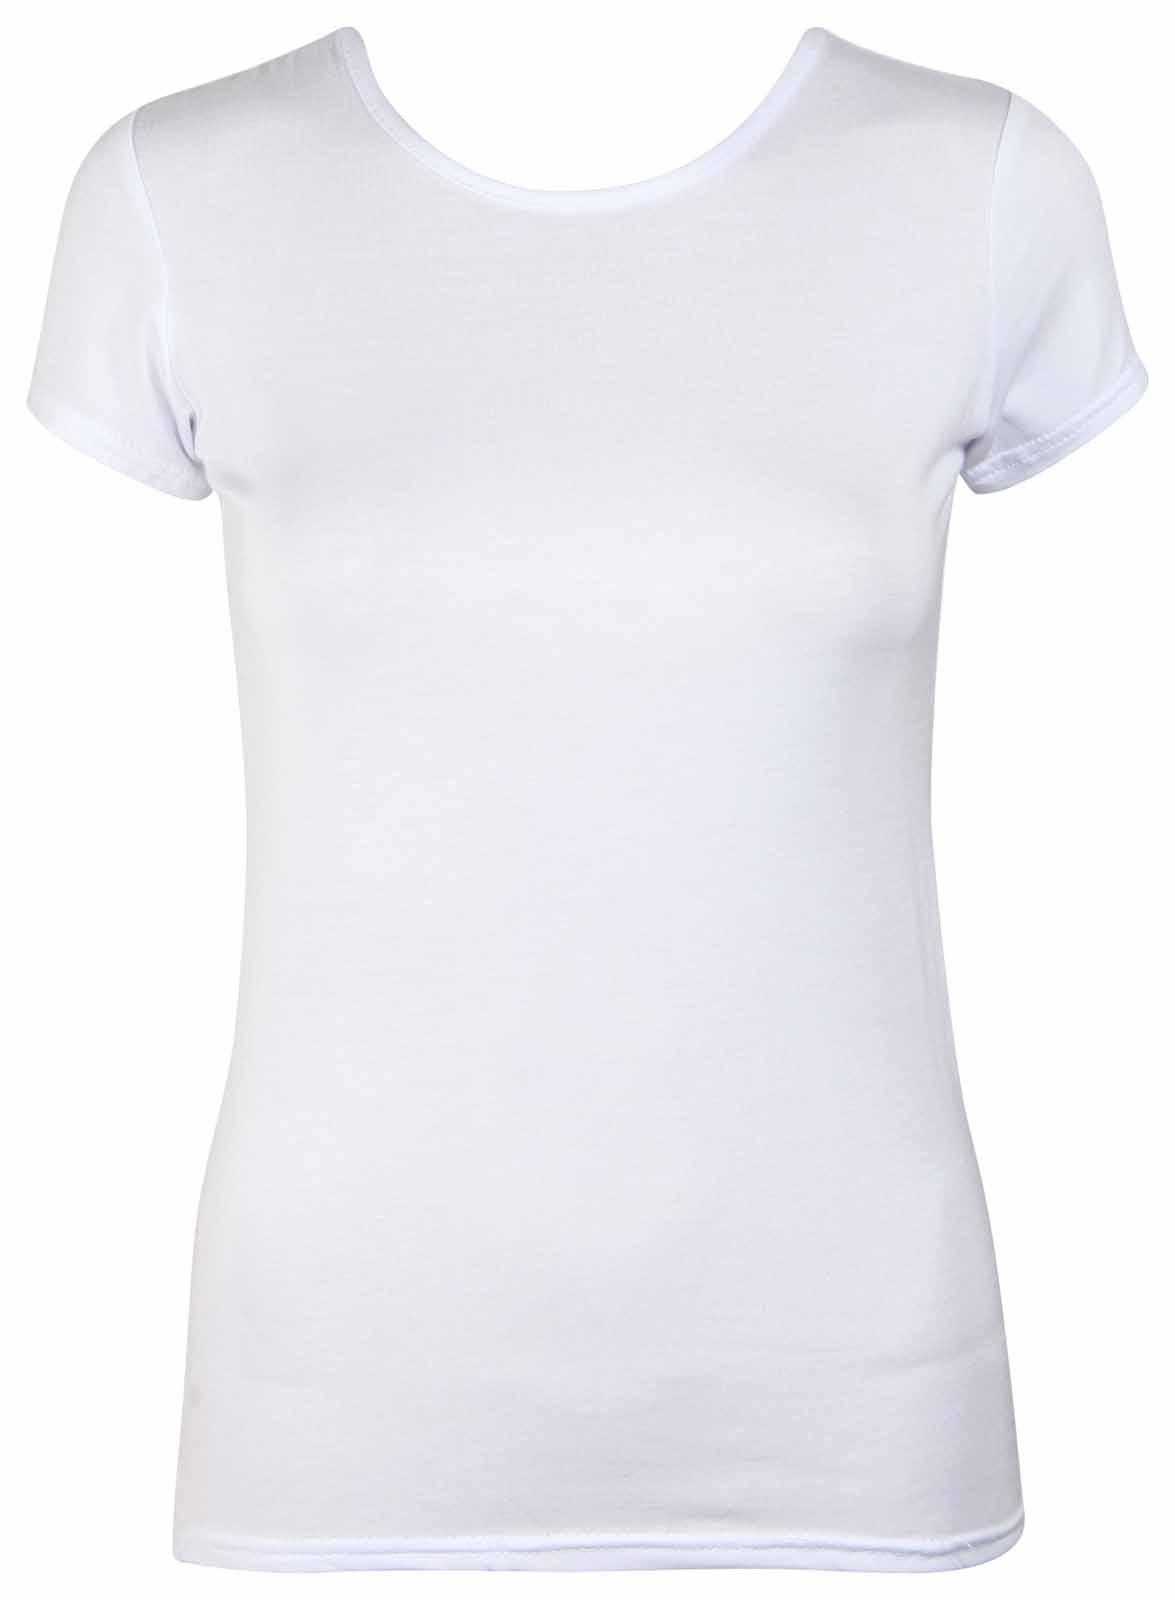 Womens new plain stretch fit crew neck top ladies short for Crew neck t shirt women